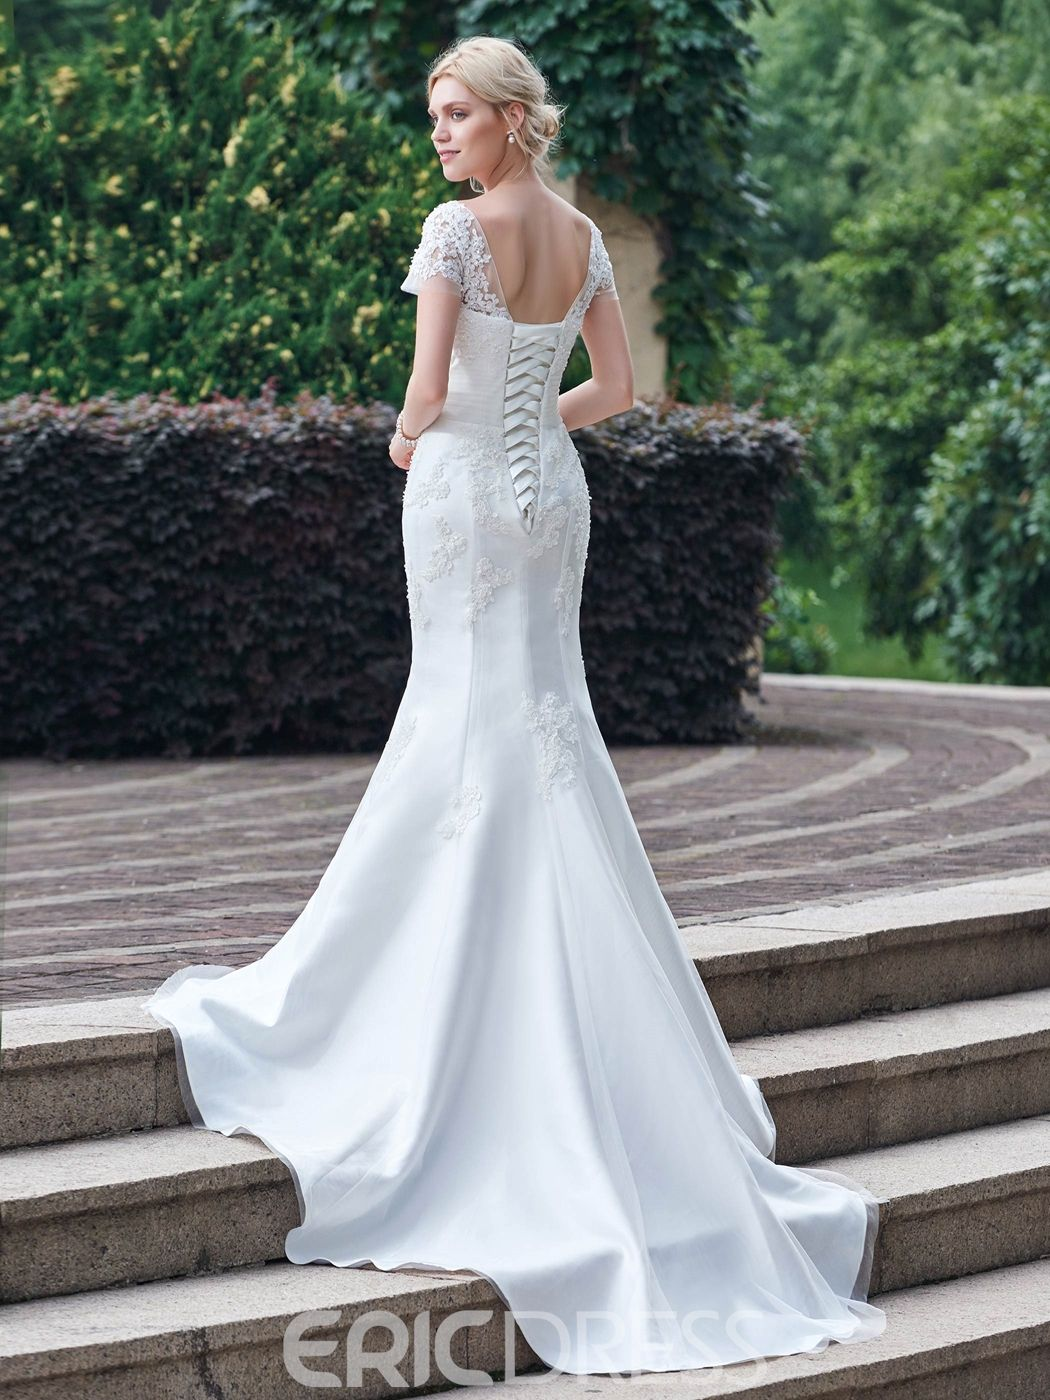 Lace sleeve mermaid wedding dress  Classic Appliques Scoop Short Sleeves Mermaid Wedding Dress